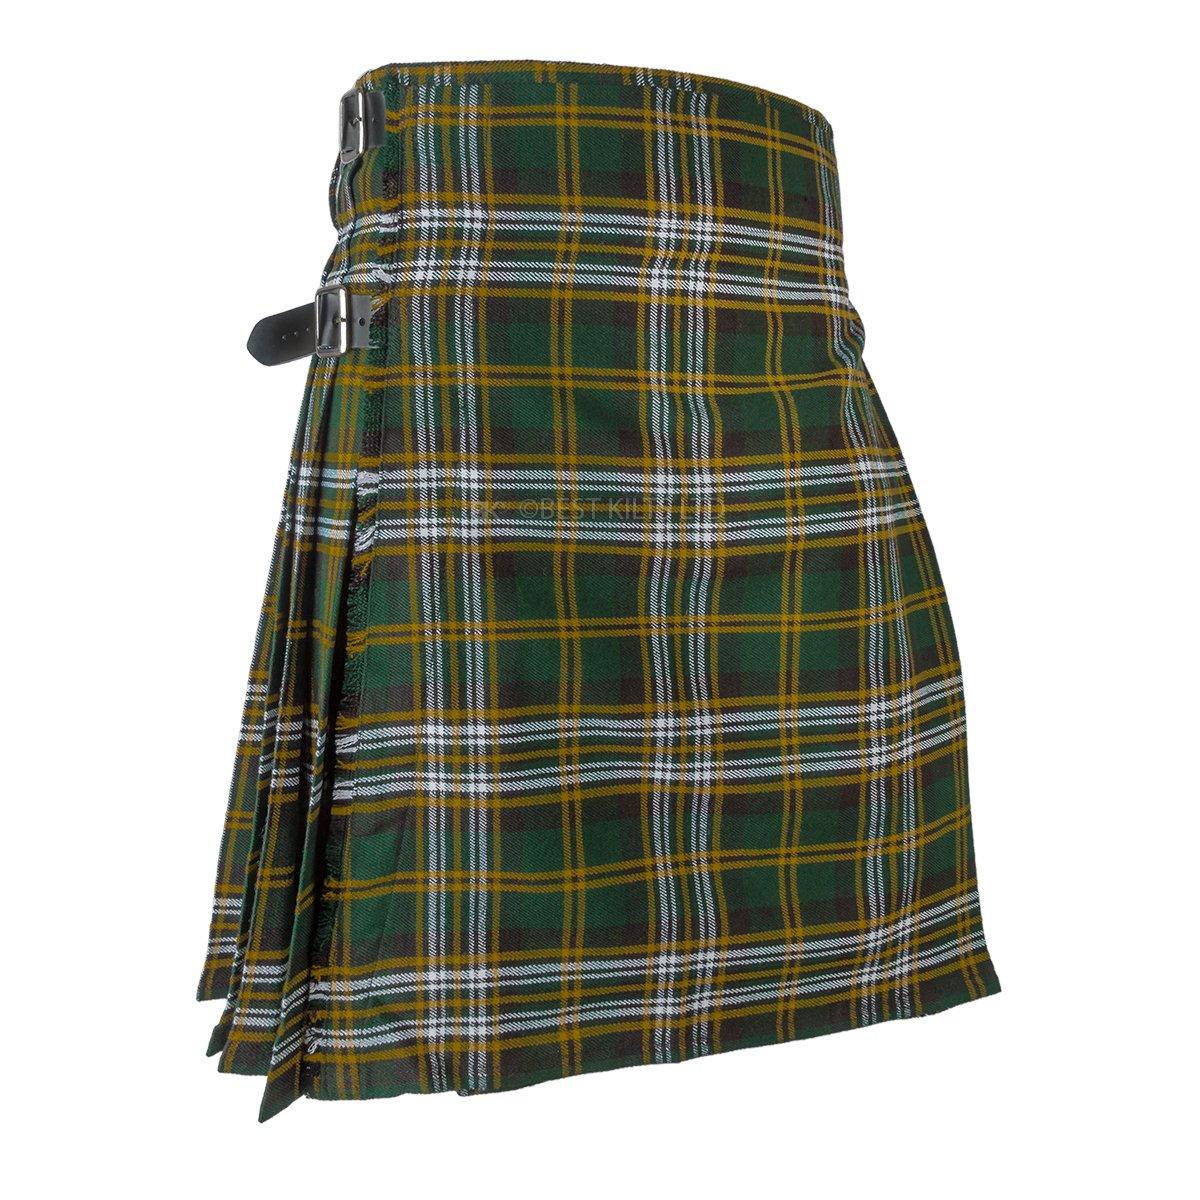 Best Kilts Men's Scottish 5 Yard Best Value Kilt Heritage Of Ireland (38''-40'')